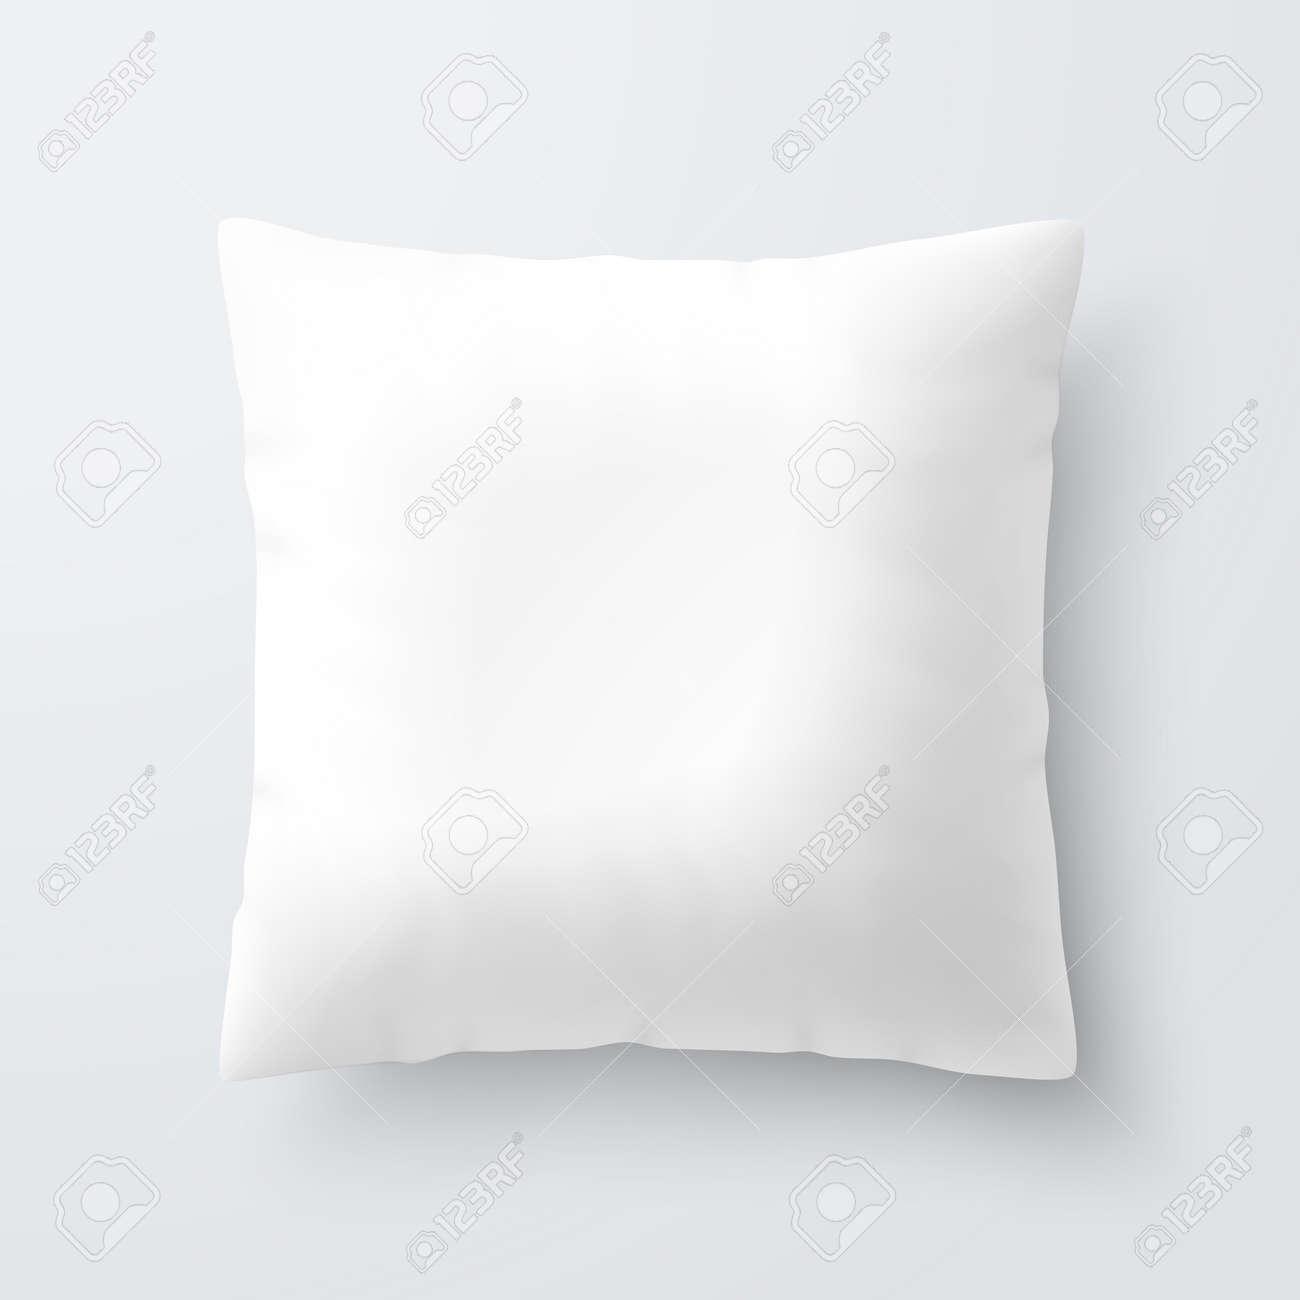 Blank white square pillow cushion - 55657010